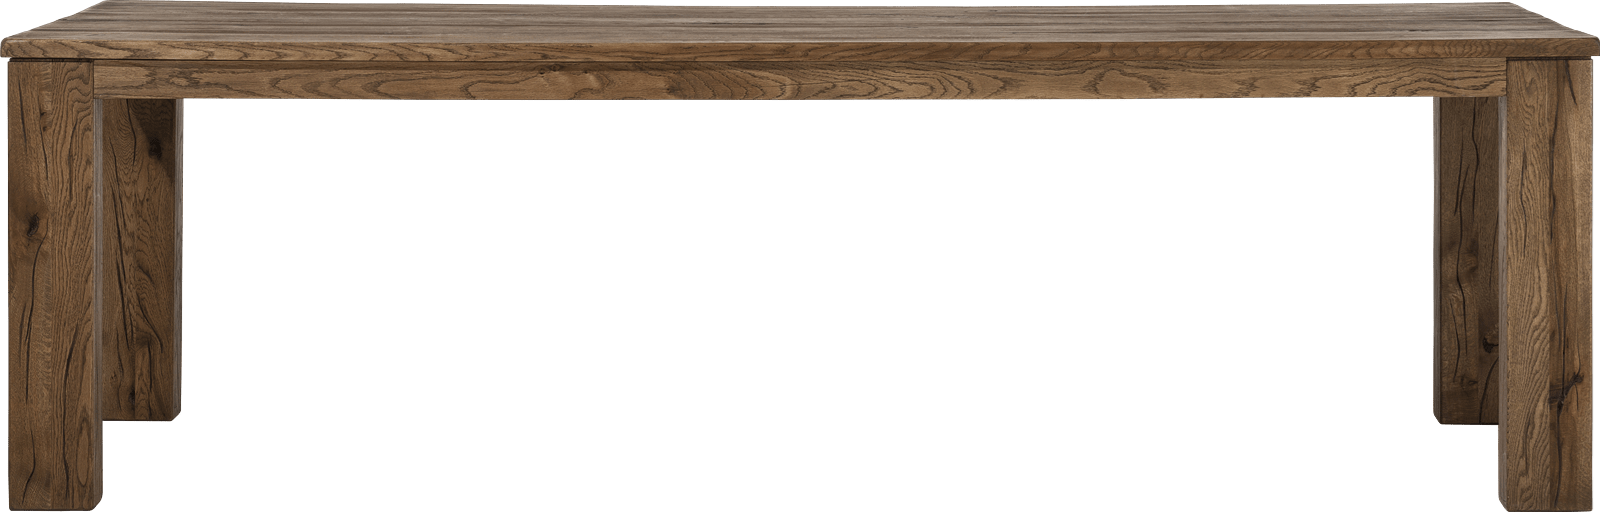 Masters - eetkamertafel 260 x 100 -hout 12x12/10x14